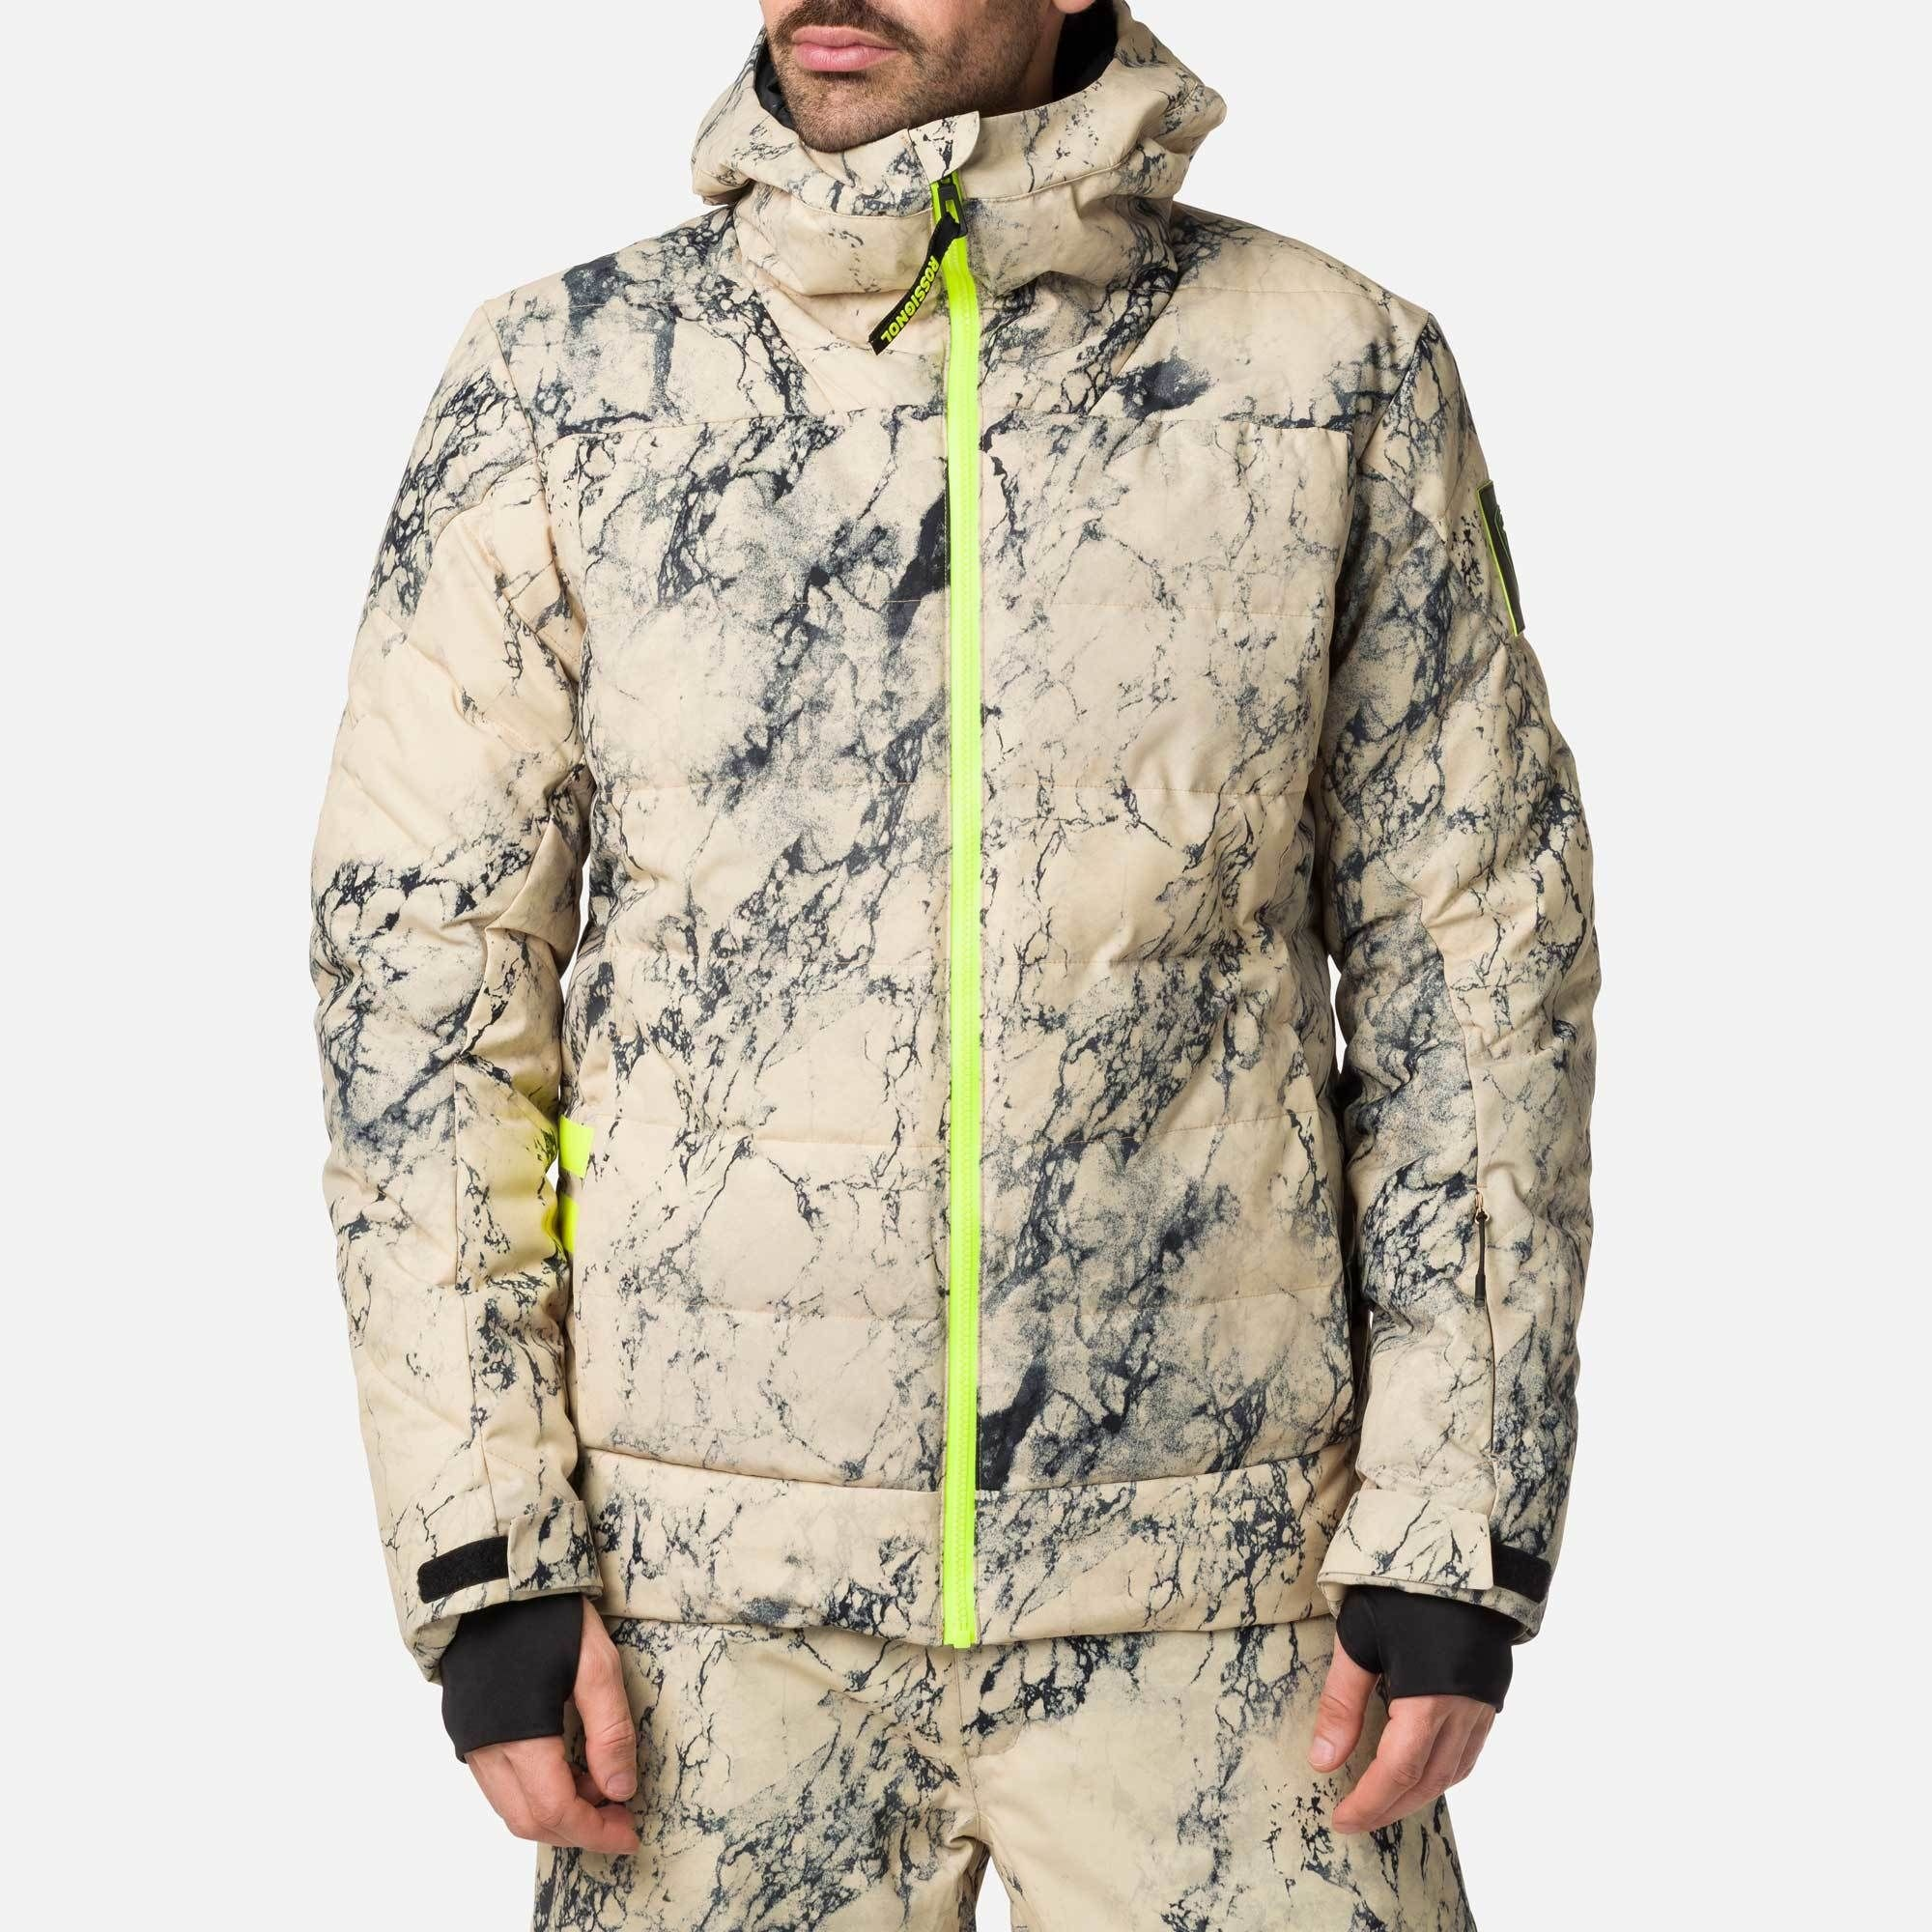 ROSSIGNOL CANADA Rapide RF Jacket, Stone Free